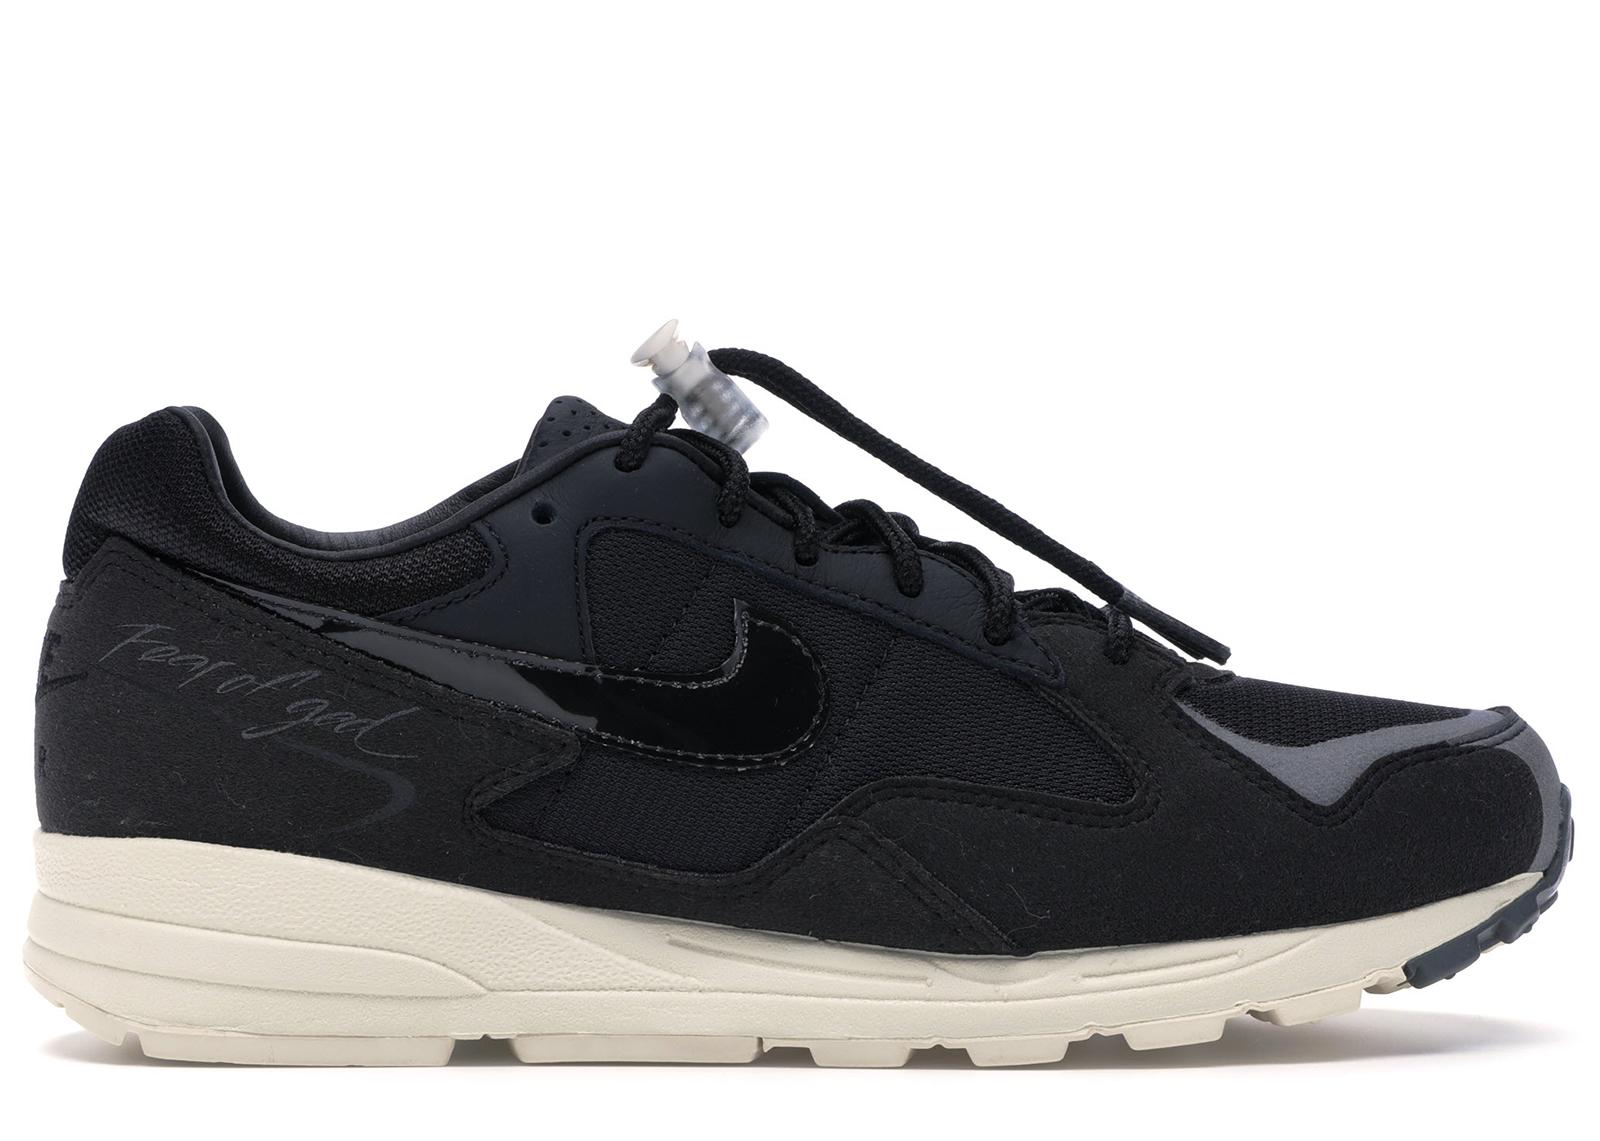 Nike Air Skylon 2 Fear of God Black